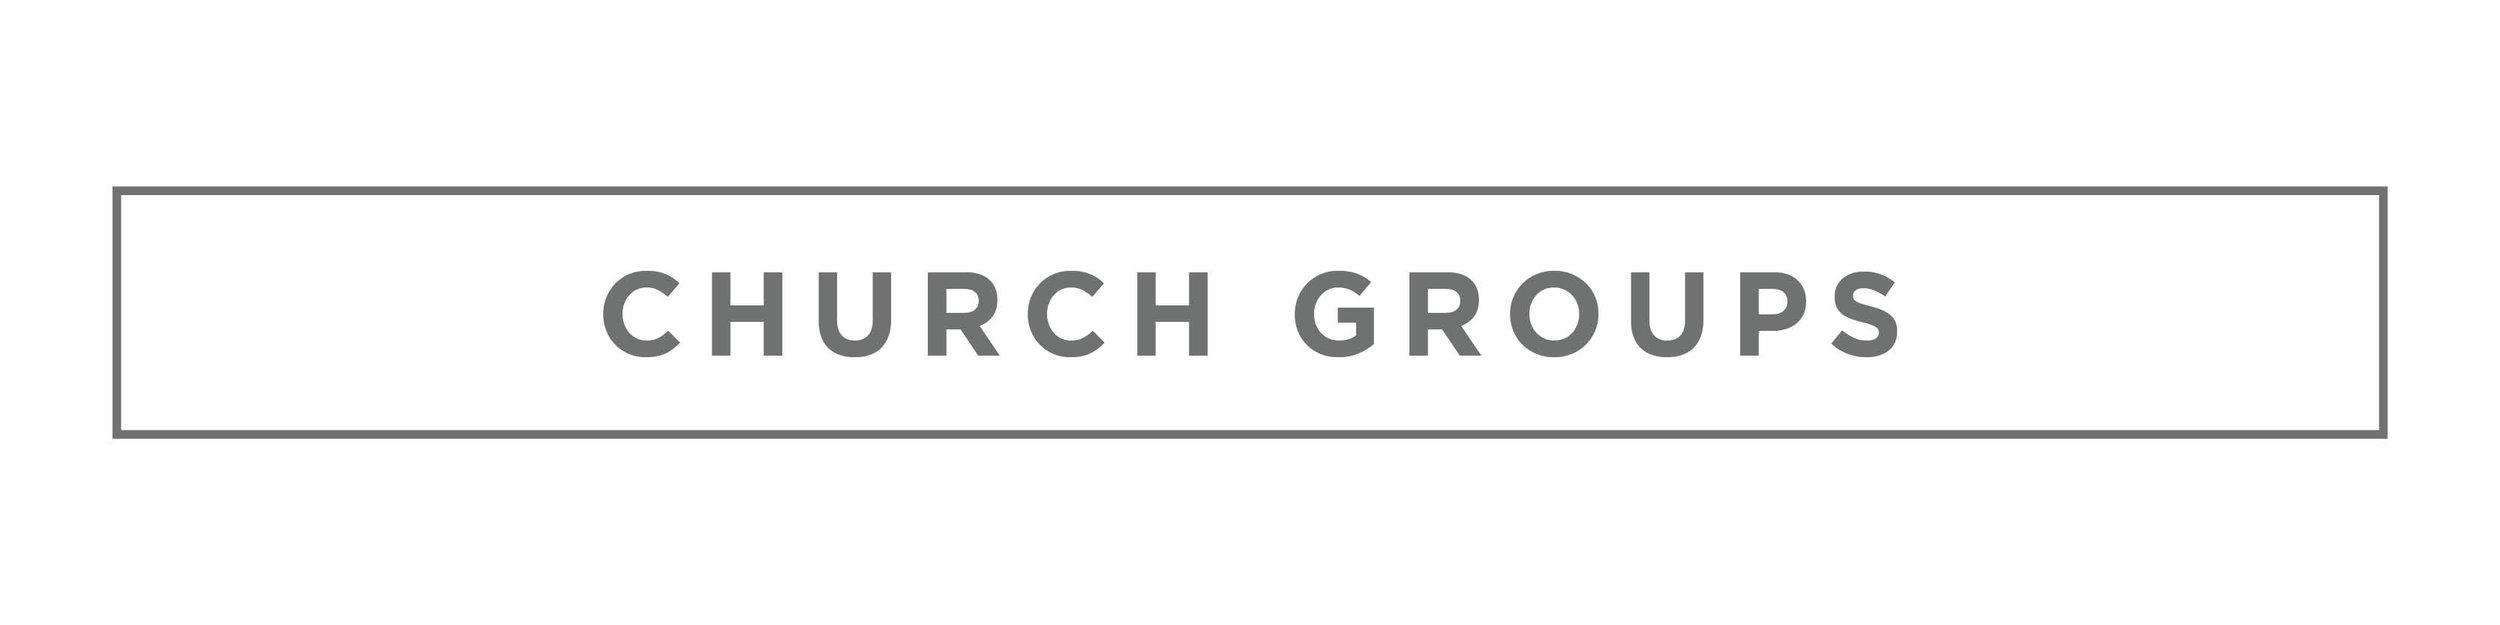 church groups1.jpg